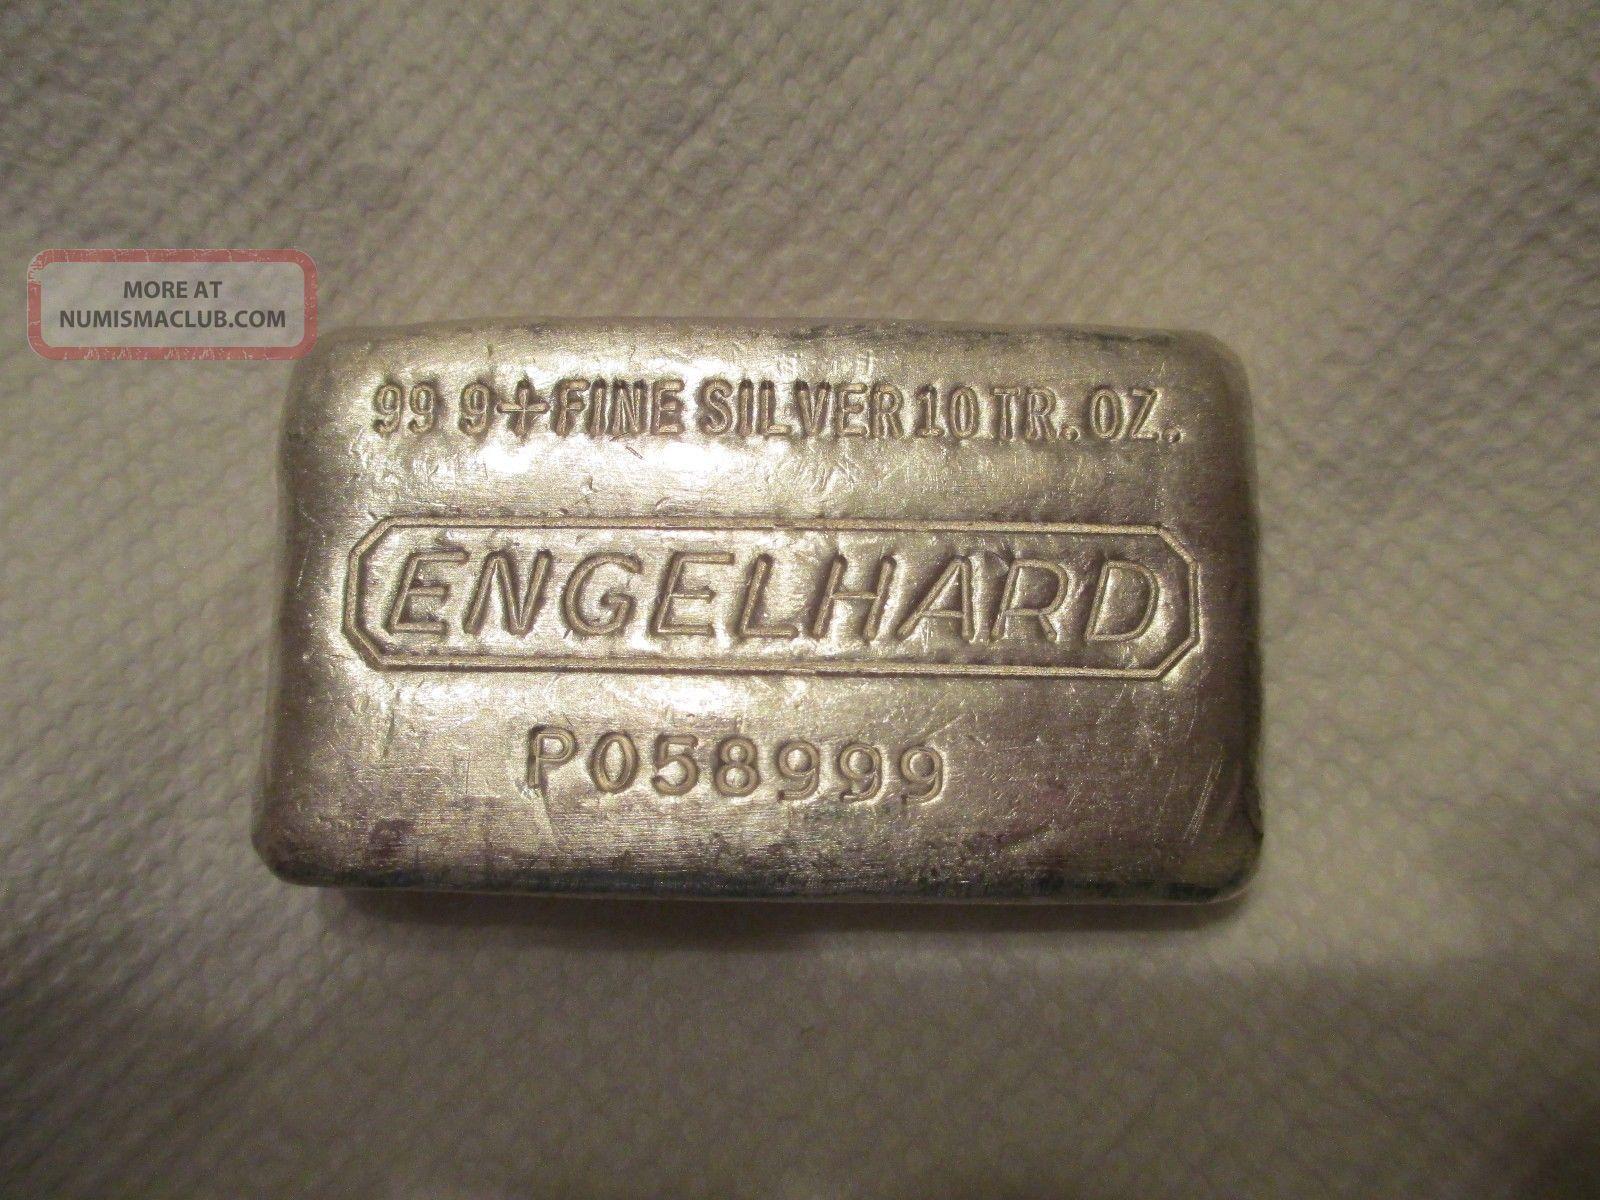 10 Oz Engelhard Silver Bar 999 Old Pour Style Silver Bar